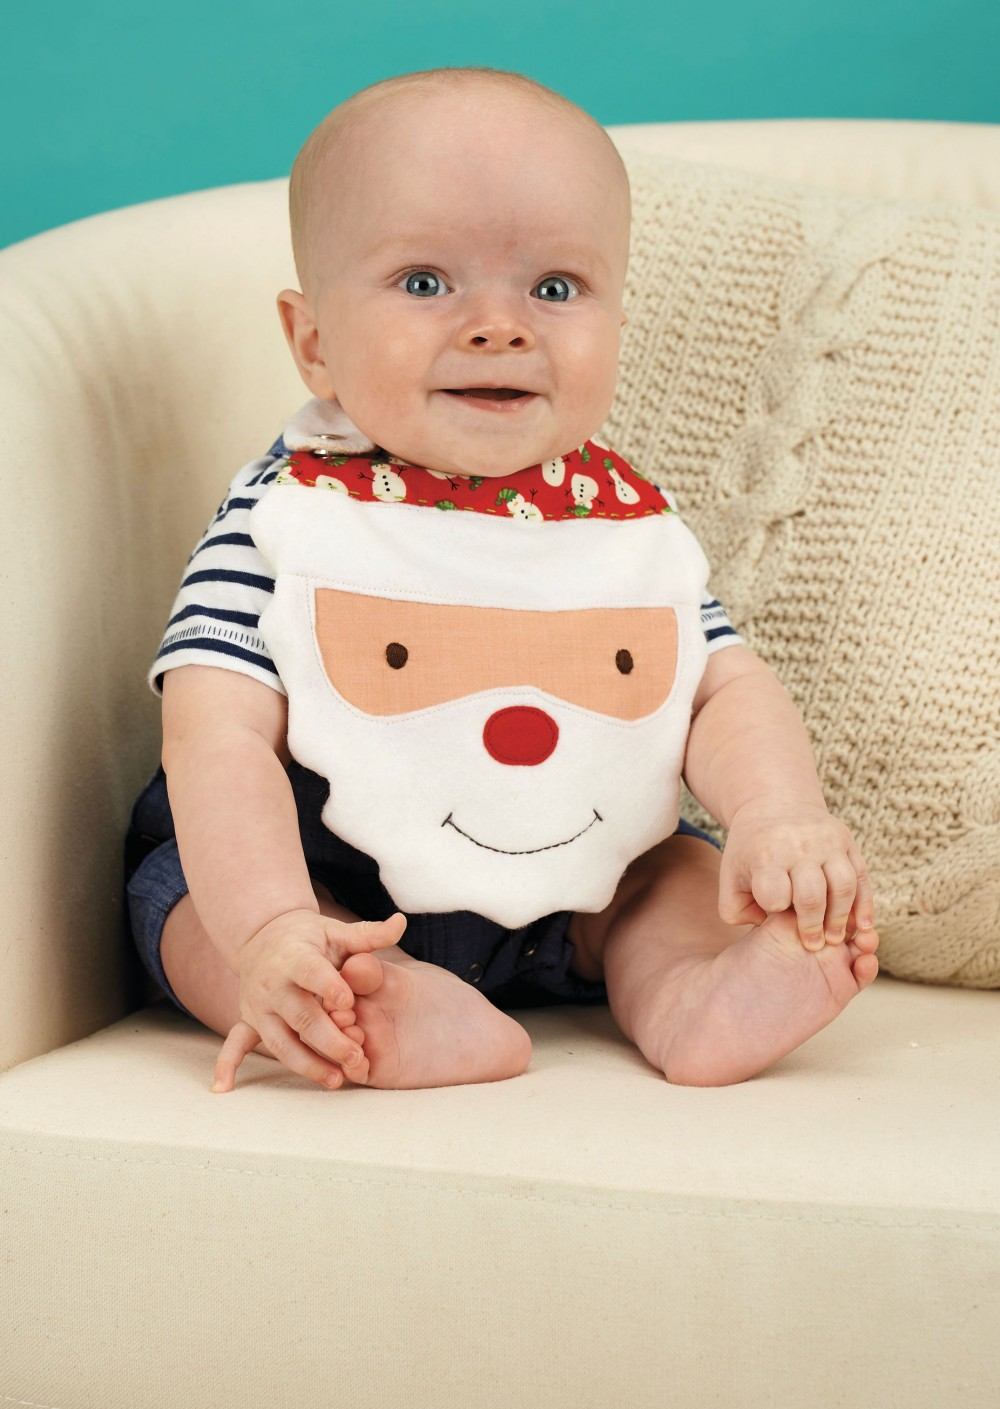 Festive Baby Bibs Free Sewing Patterns Sew Magazine